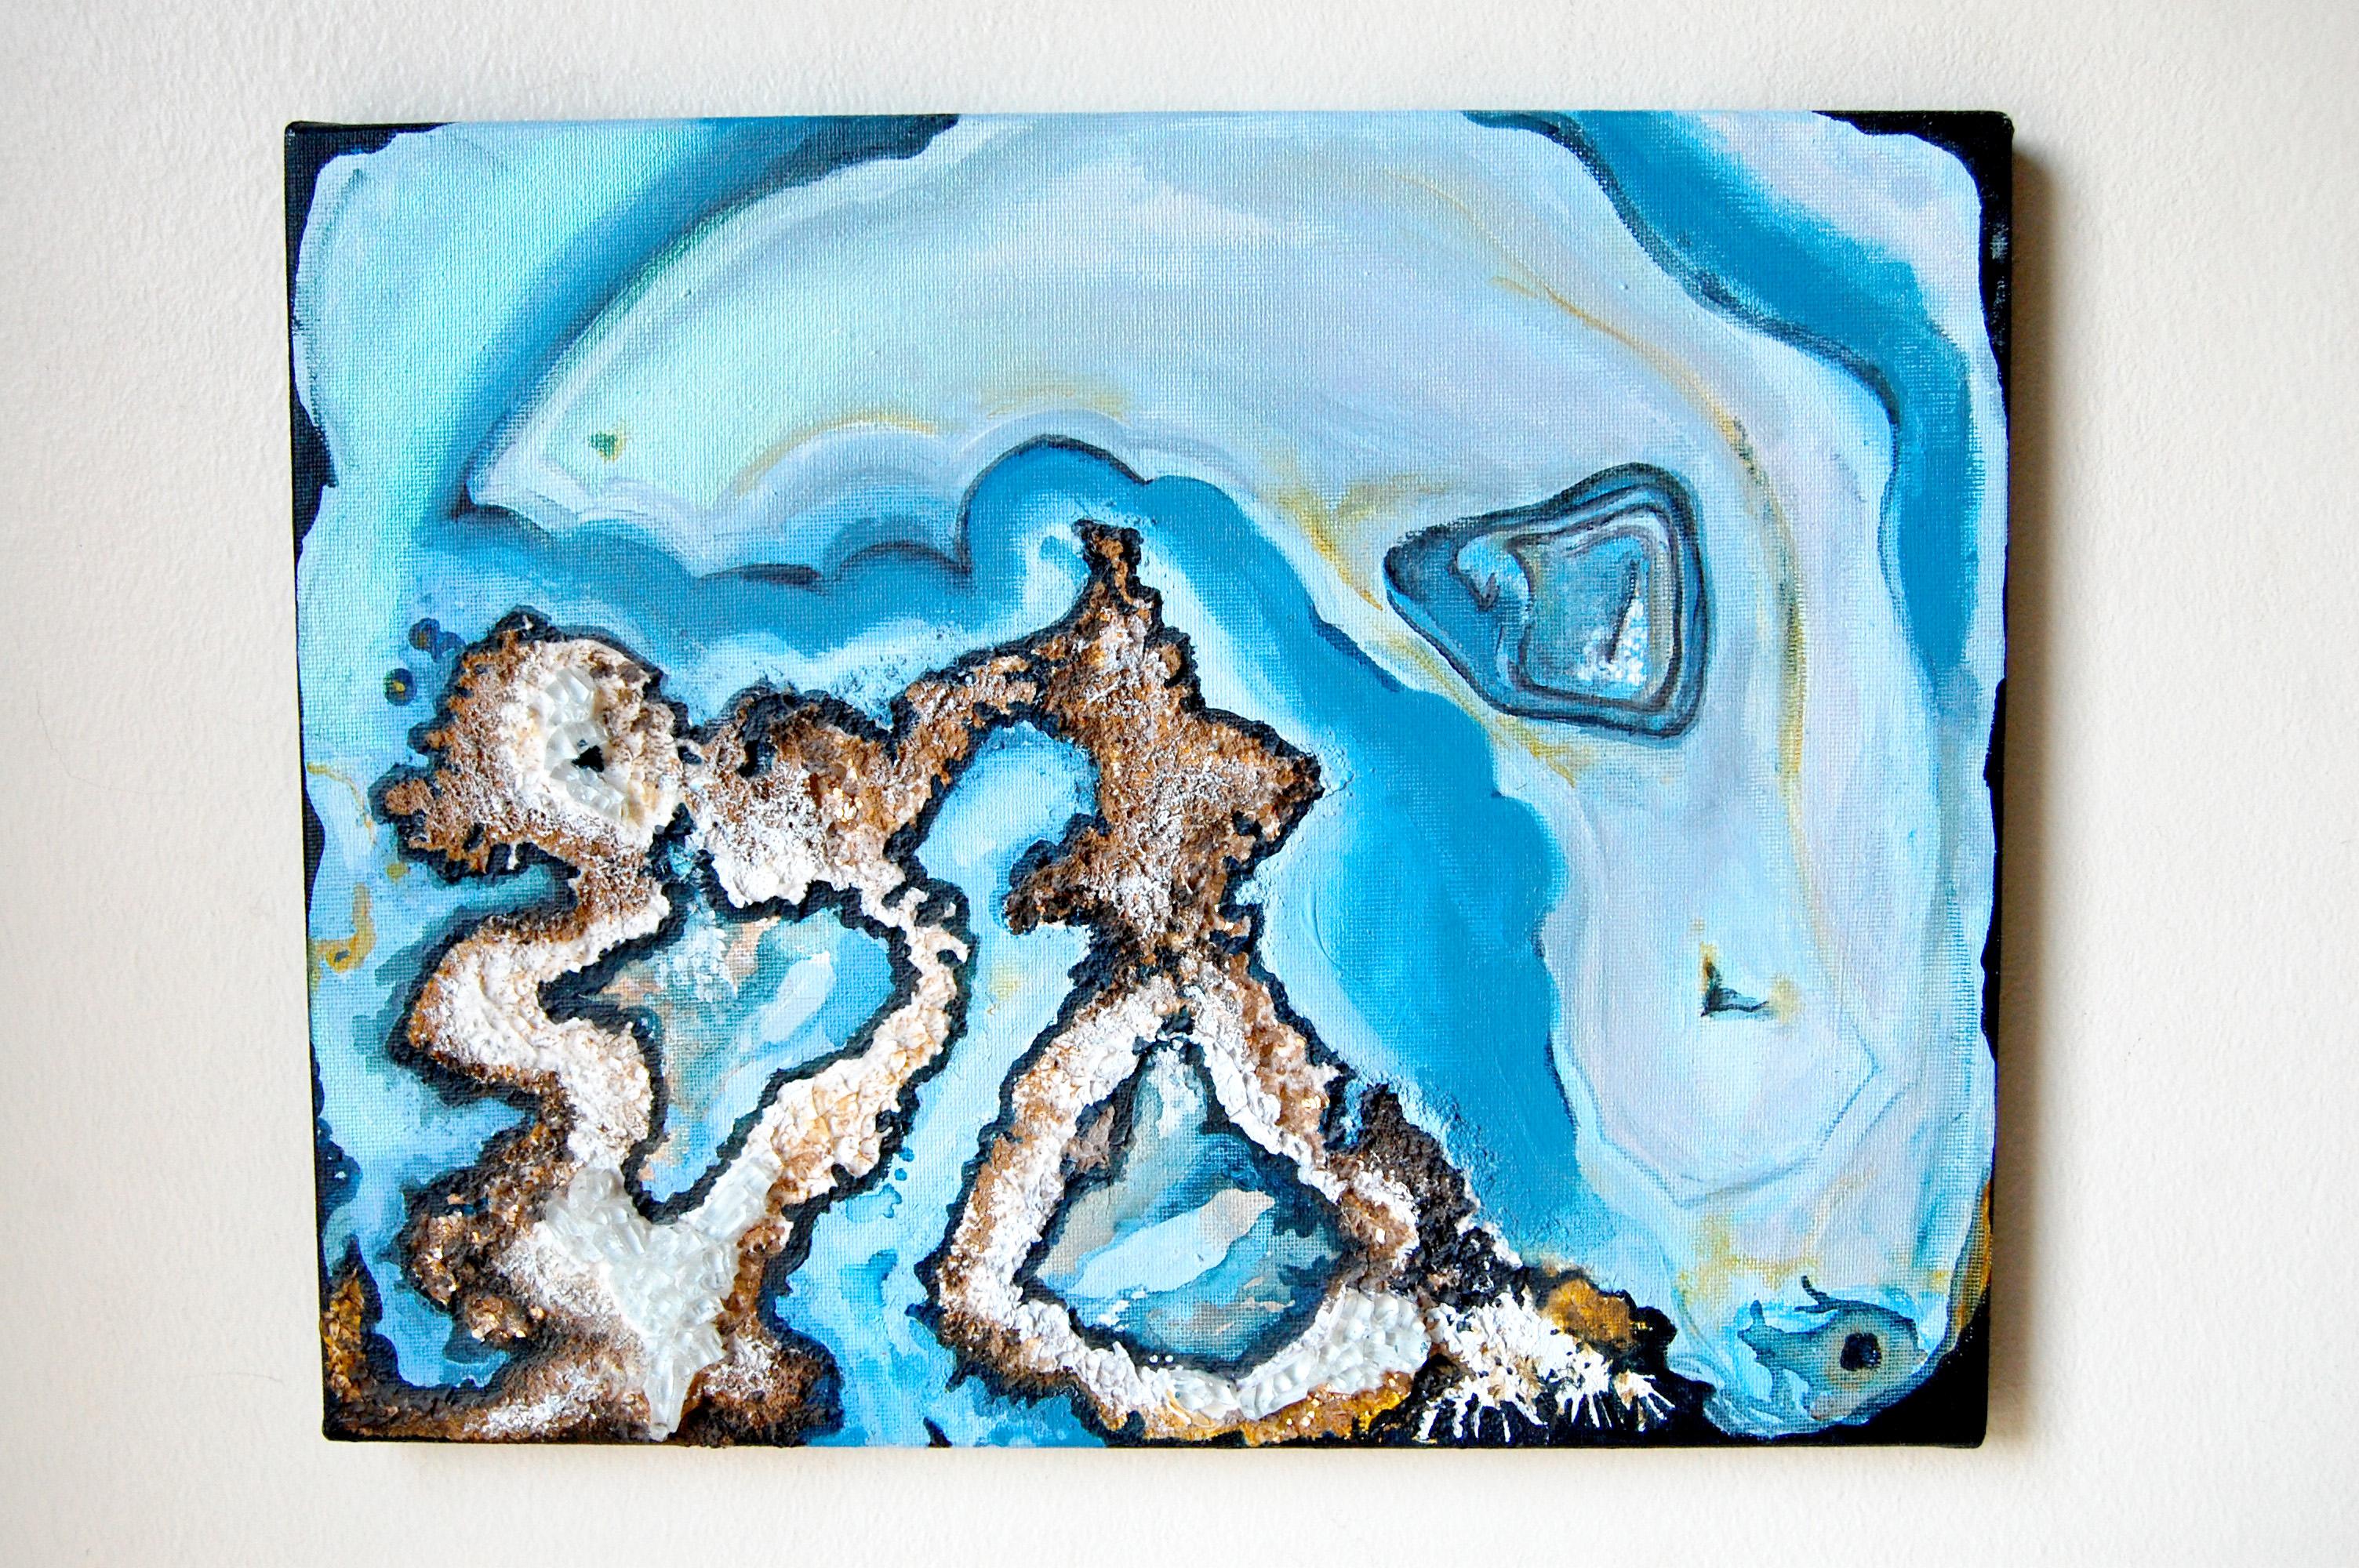 Blue Agate 2011